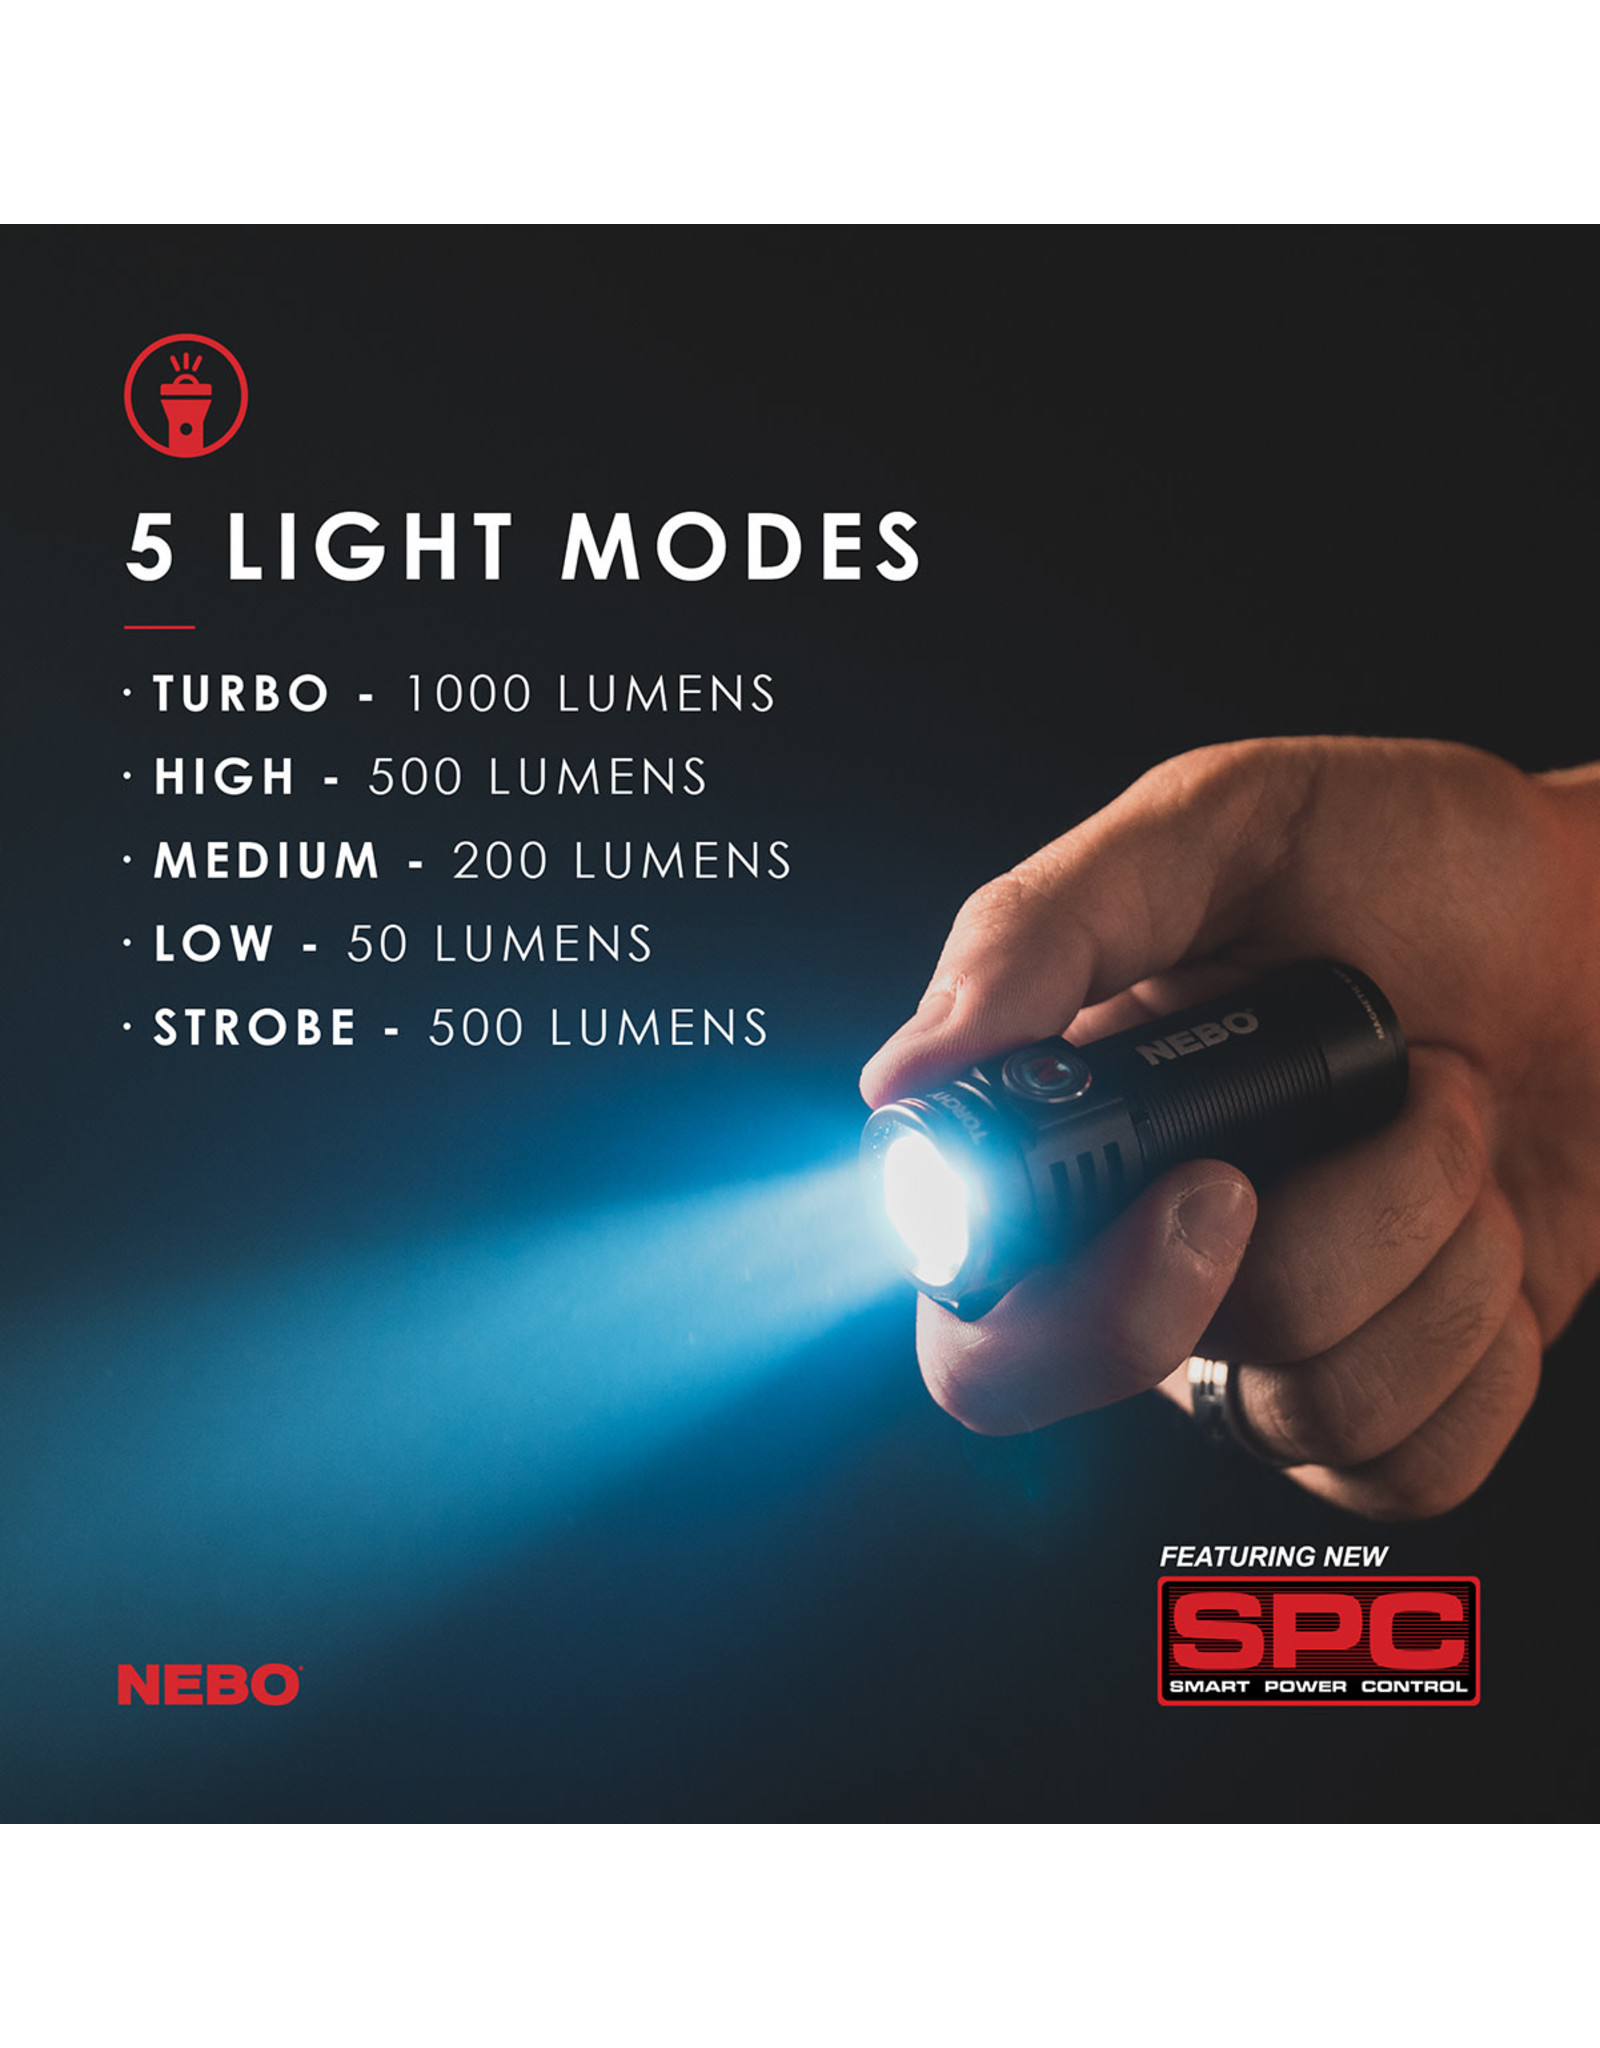 Nebo Torchy Rechargable Flashlight - 1000 Lumens